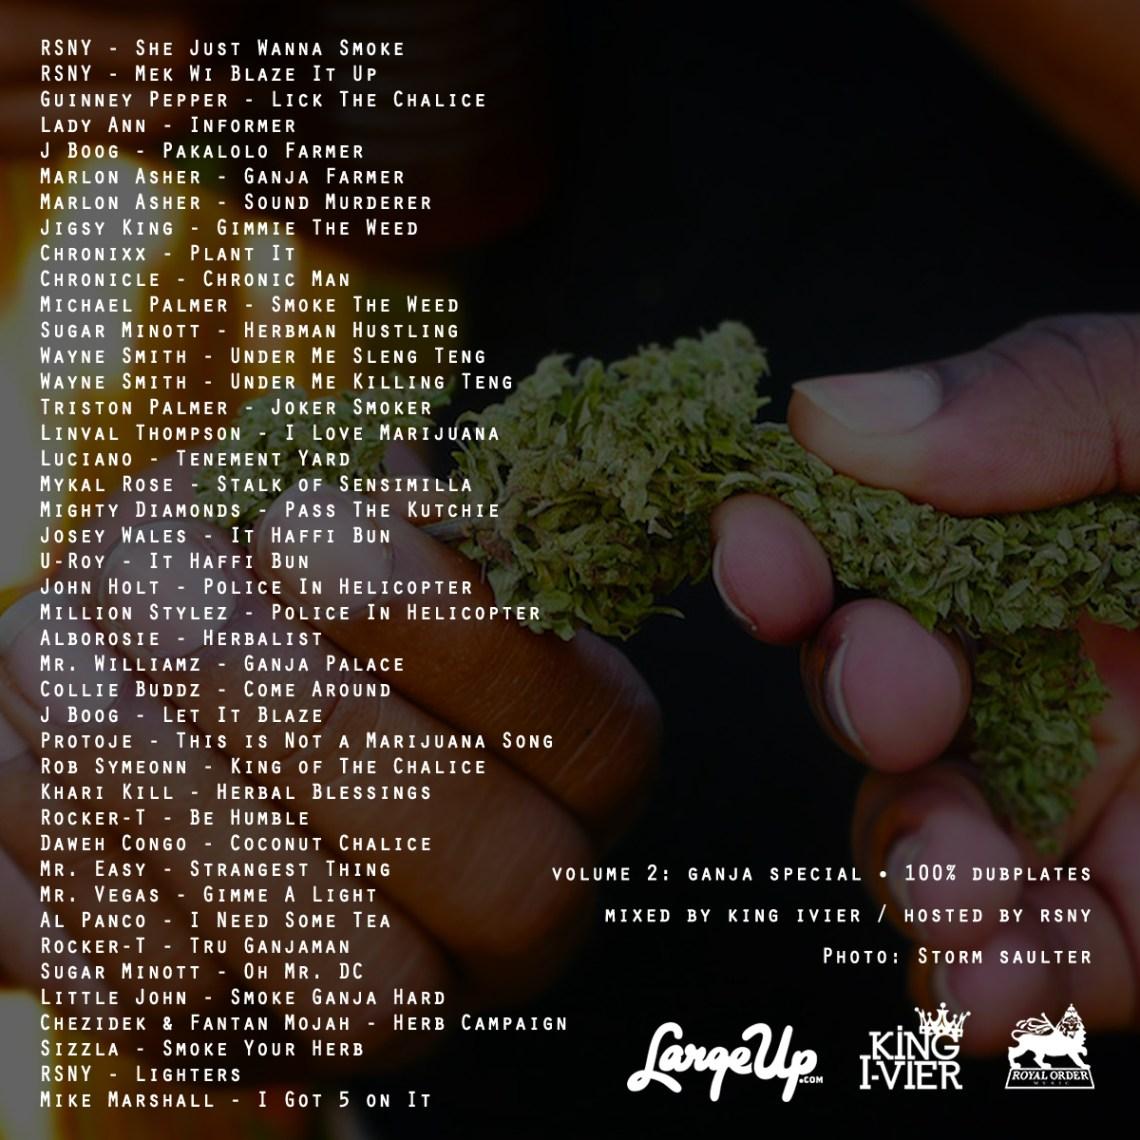 ganja-special-mixtape-king-ivier-back